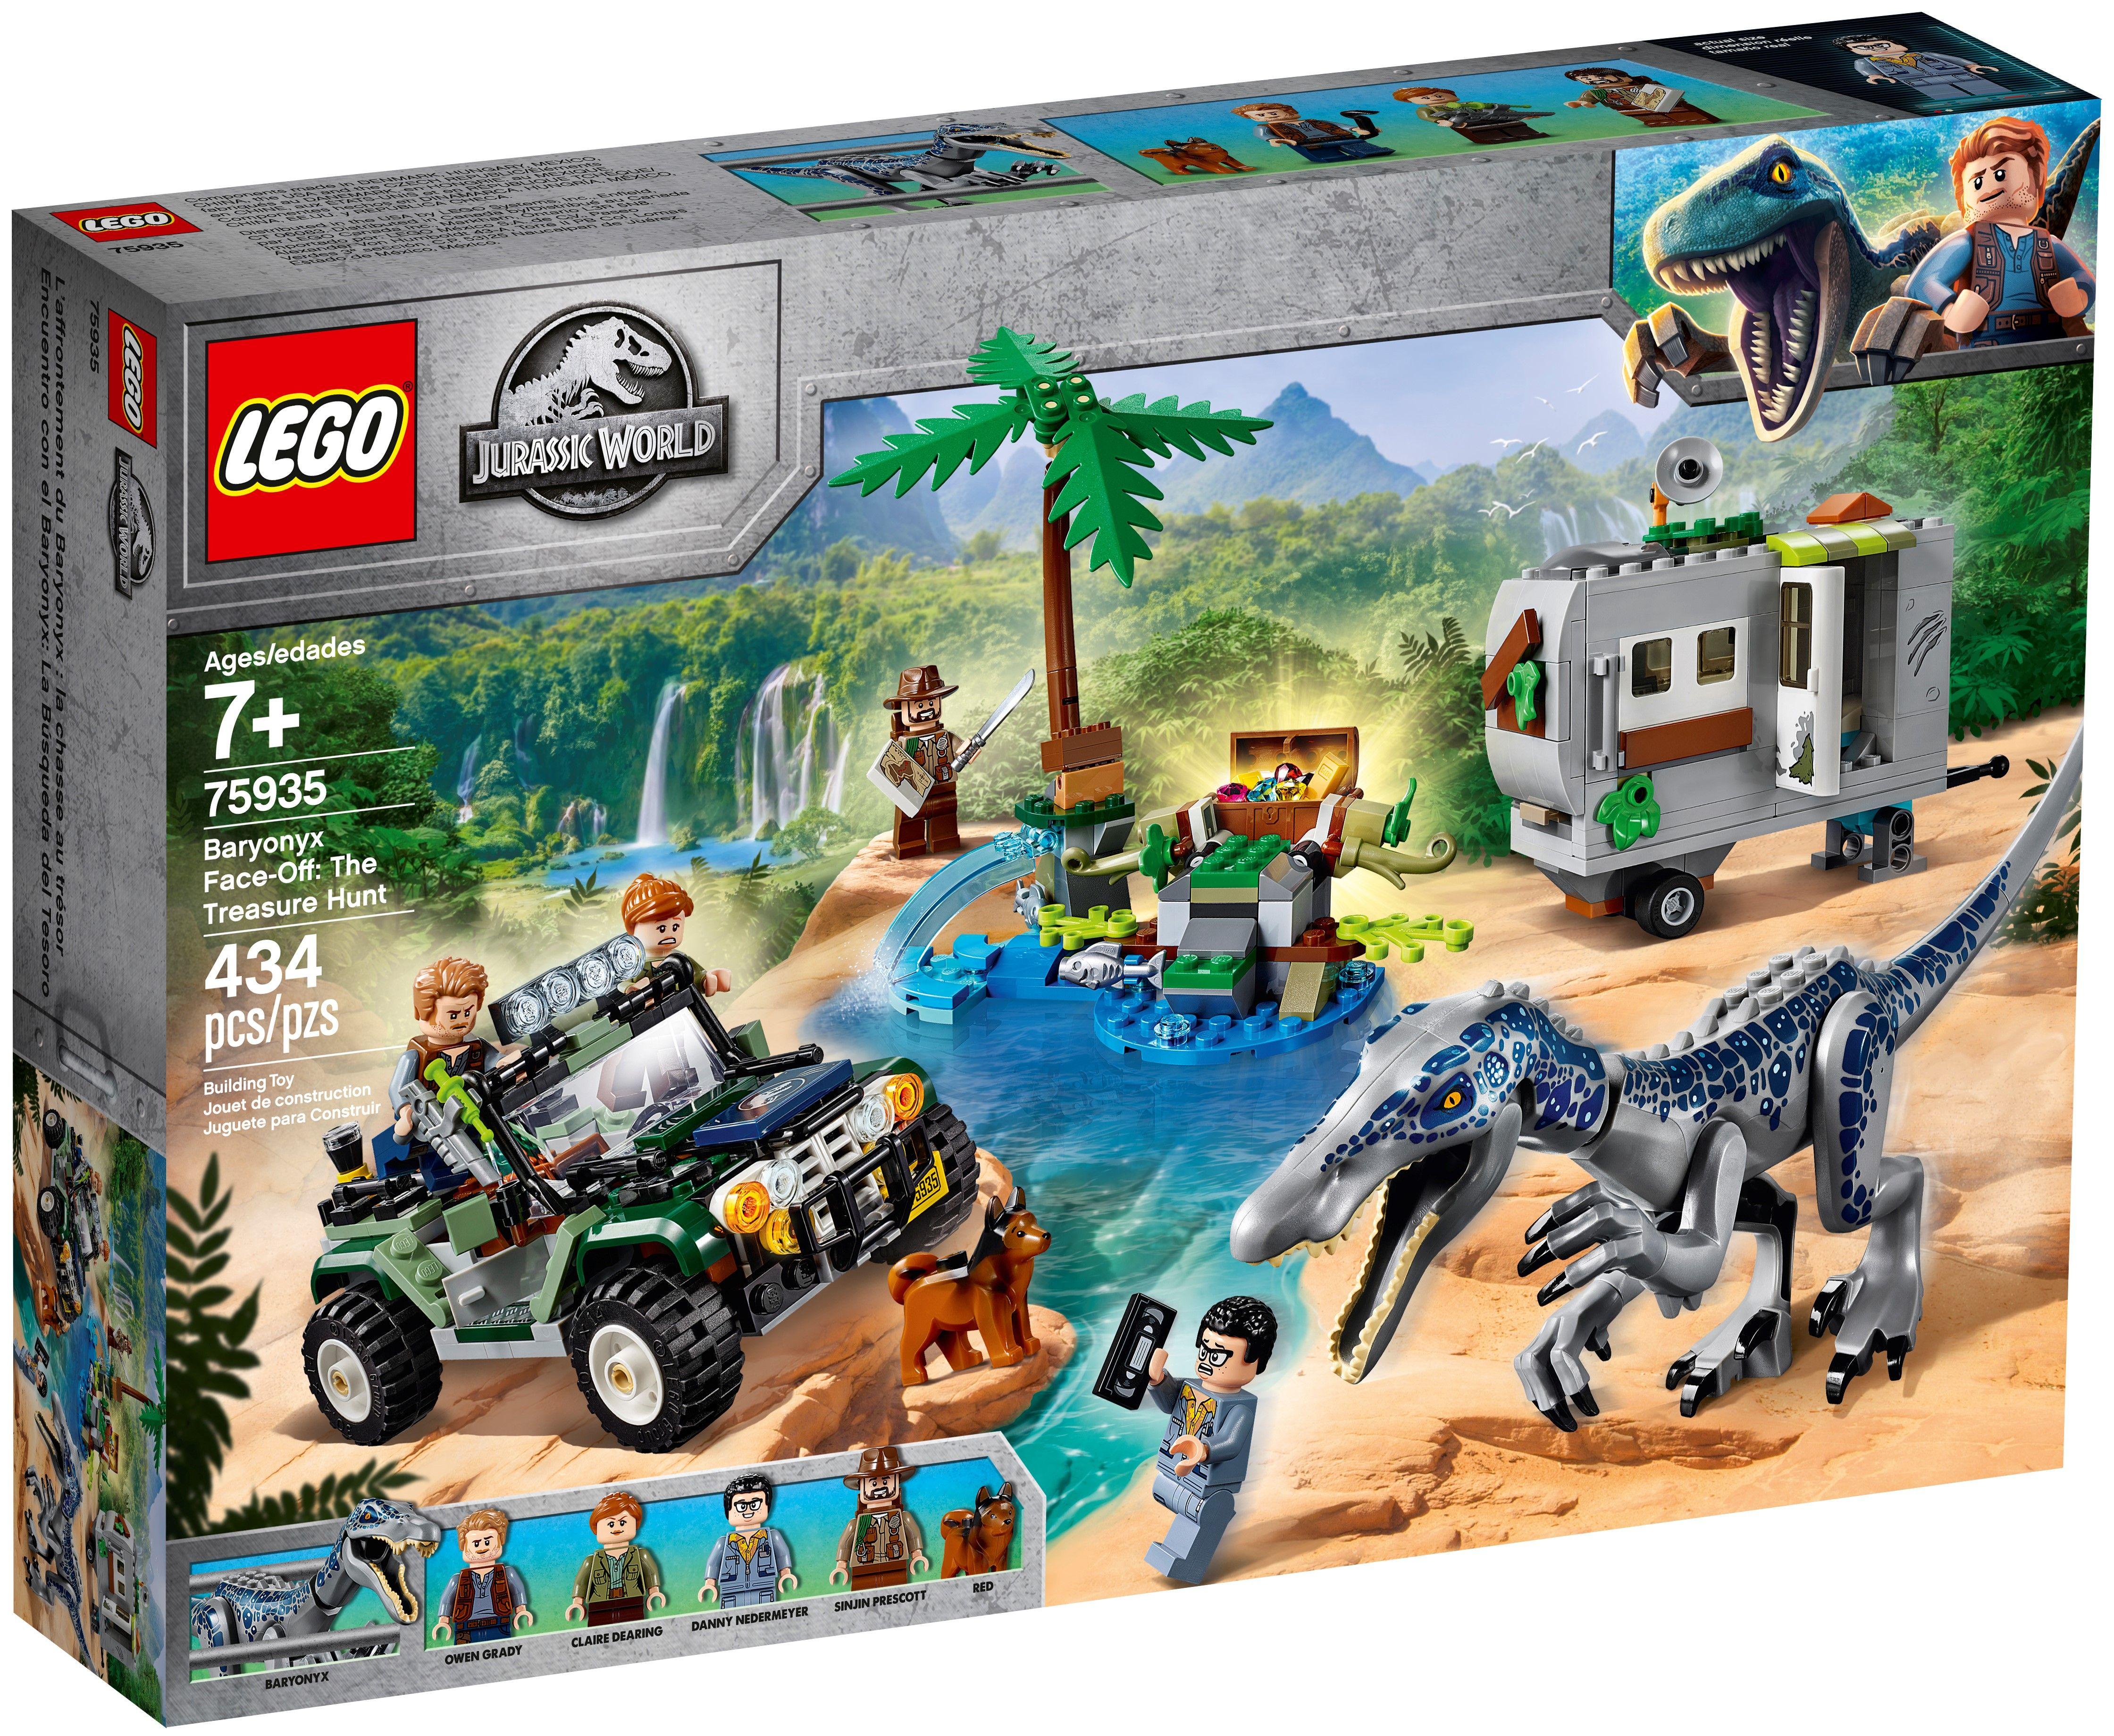 LEGO JURASSIC WORLD Baryonyx Dinosaur Raptor  75935 Figure only